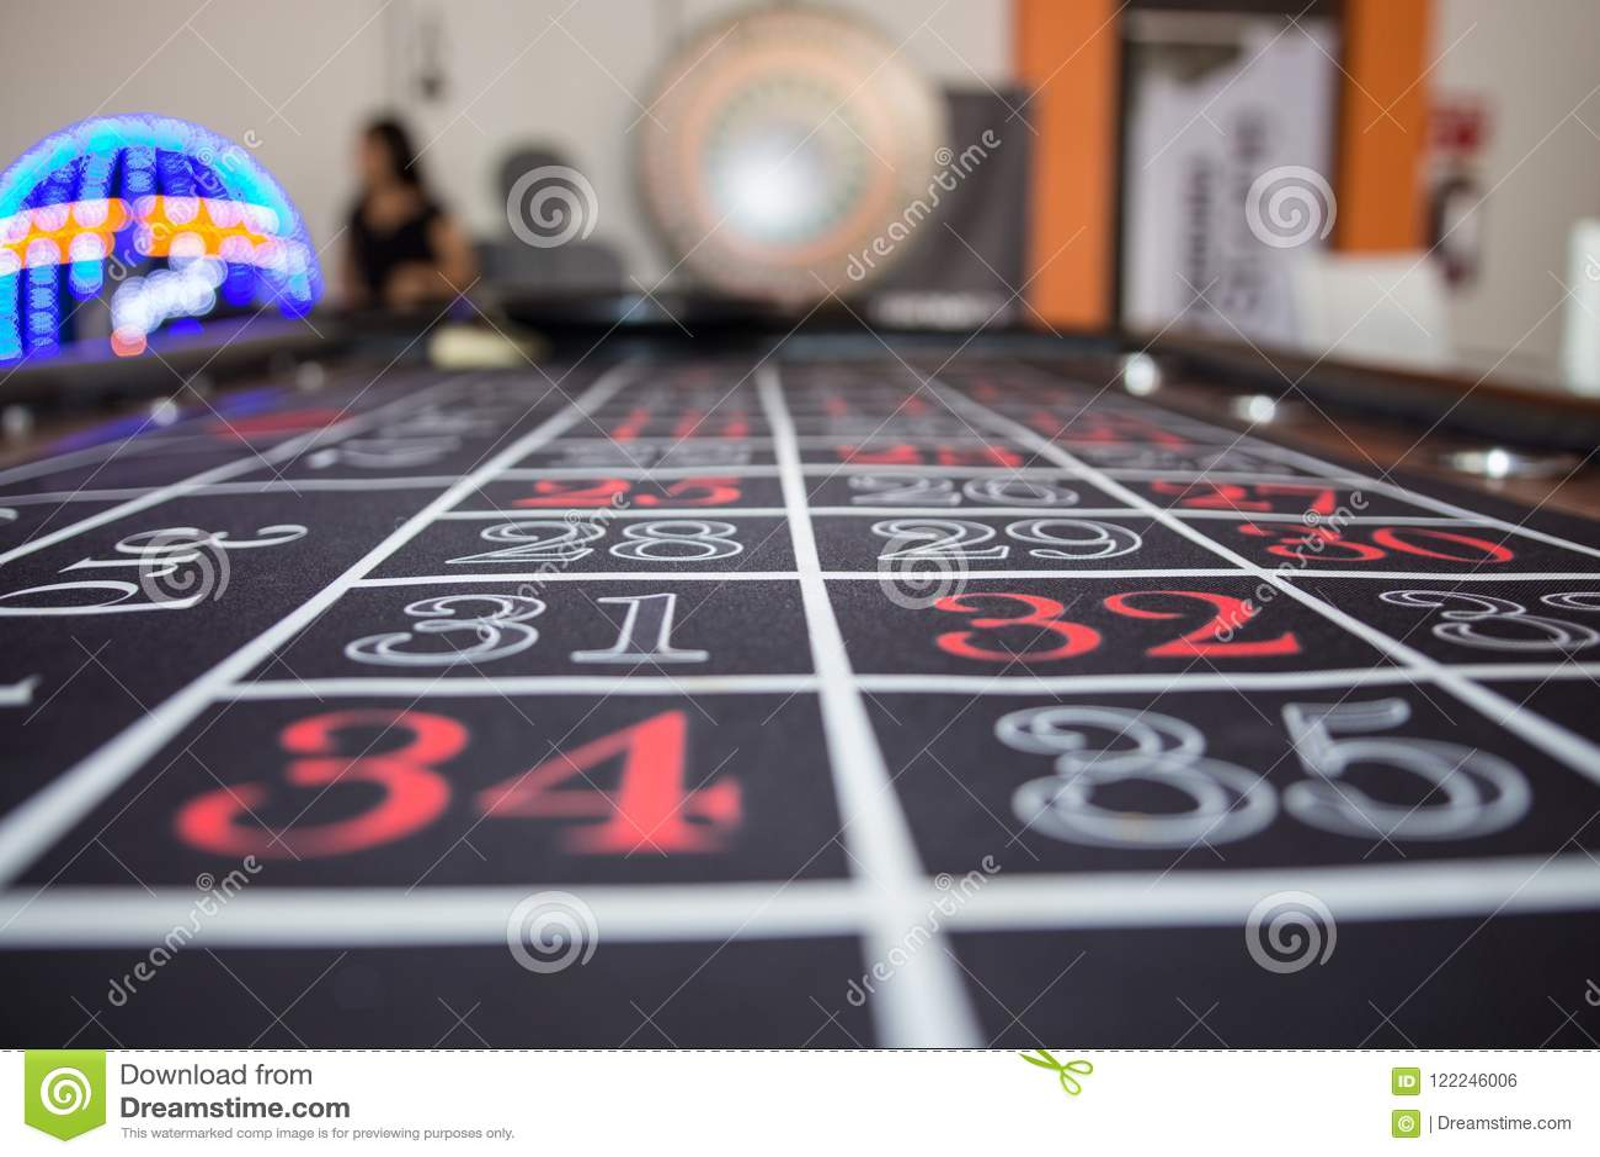 Betting games id cutoff poker position betting